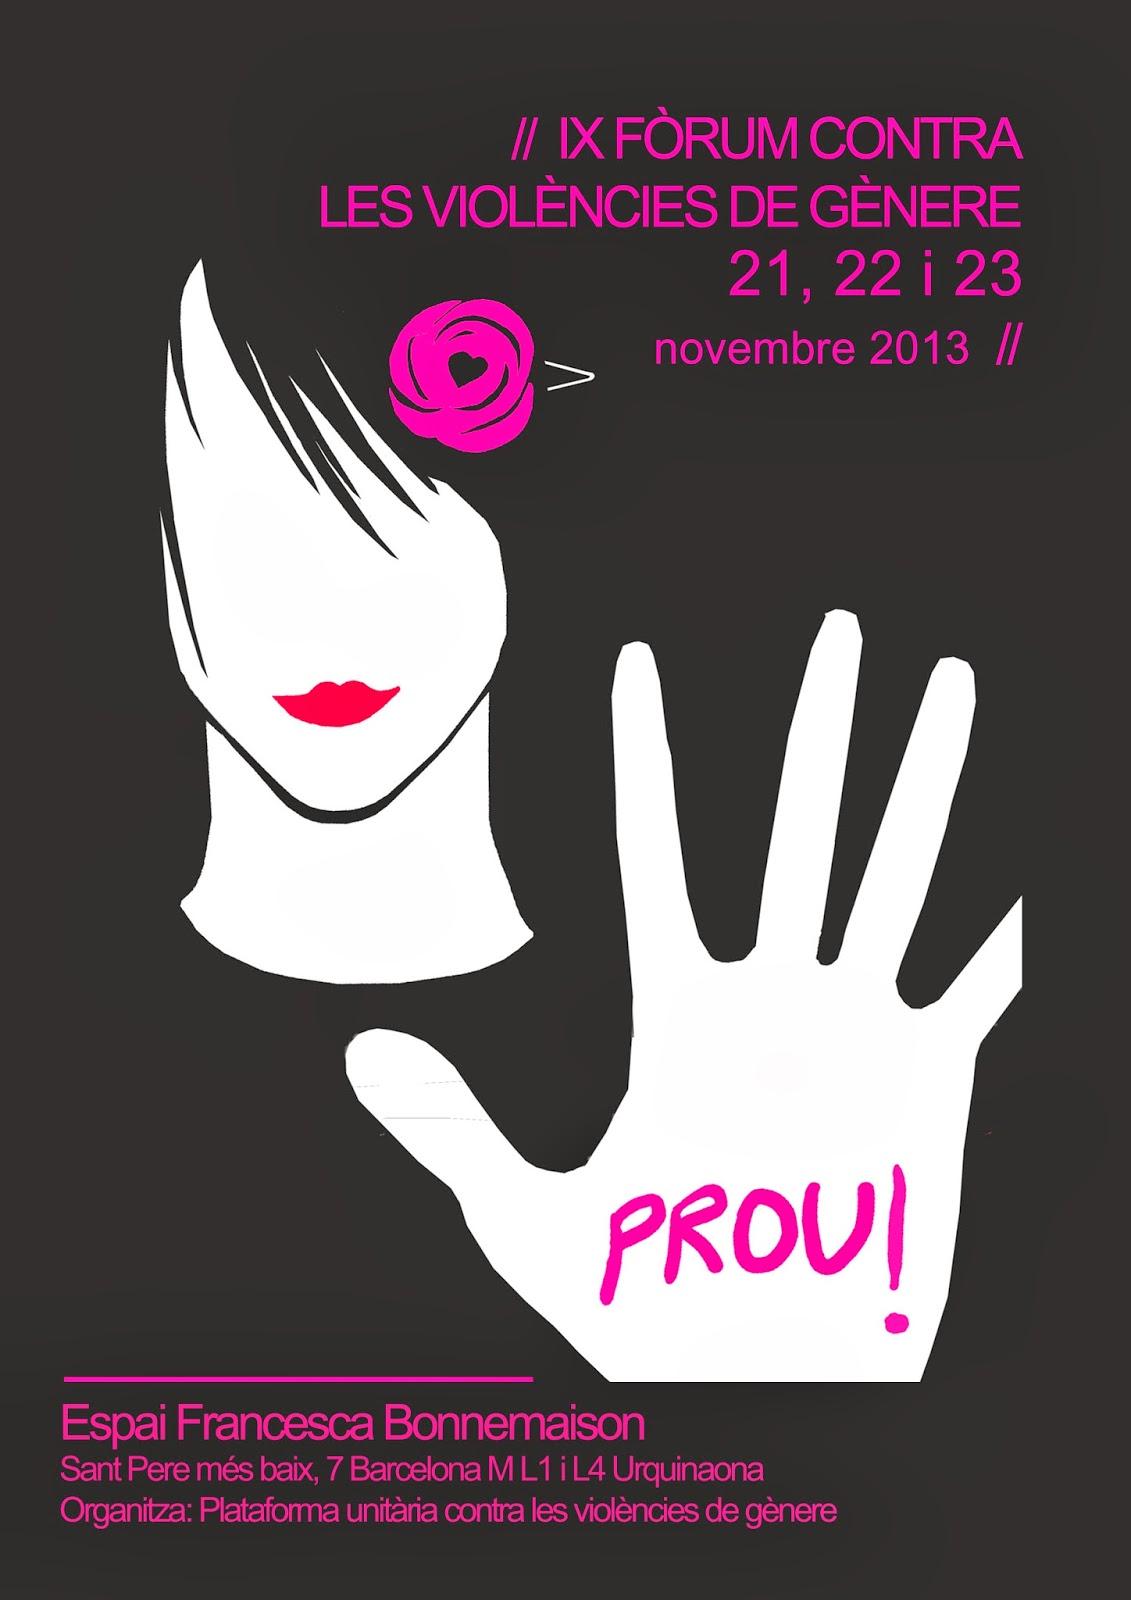 cartell pel fórum PCVG 2013 - Roser Pineda